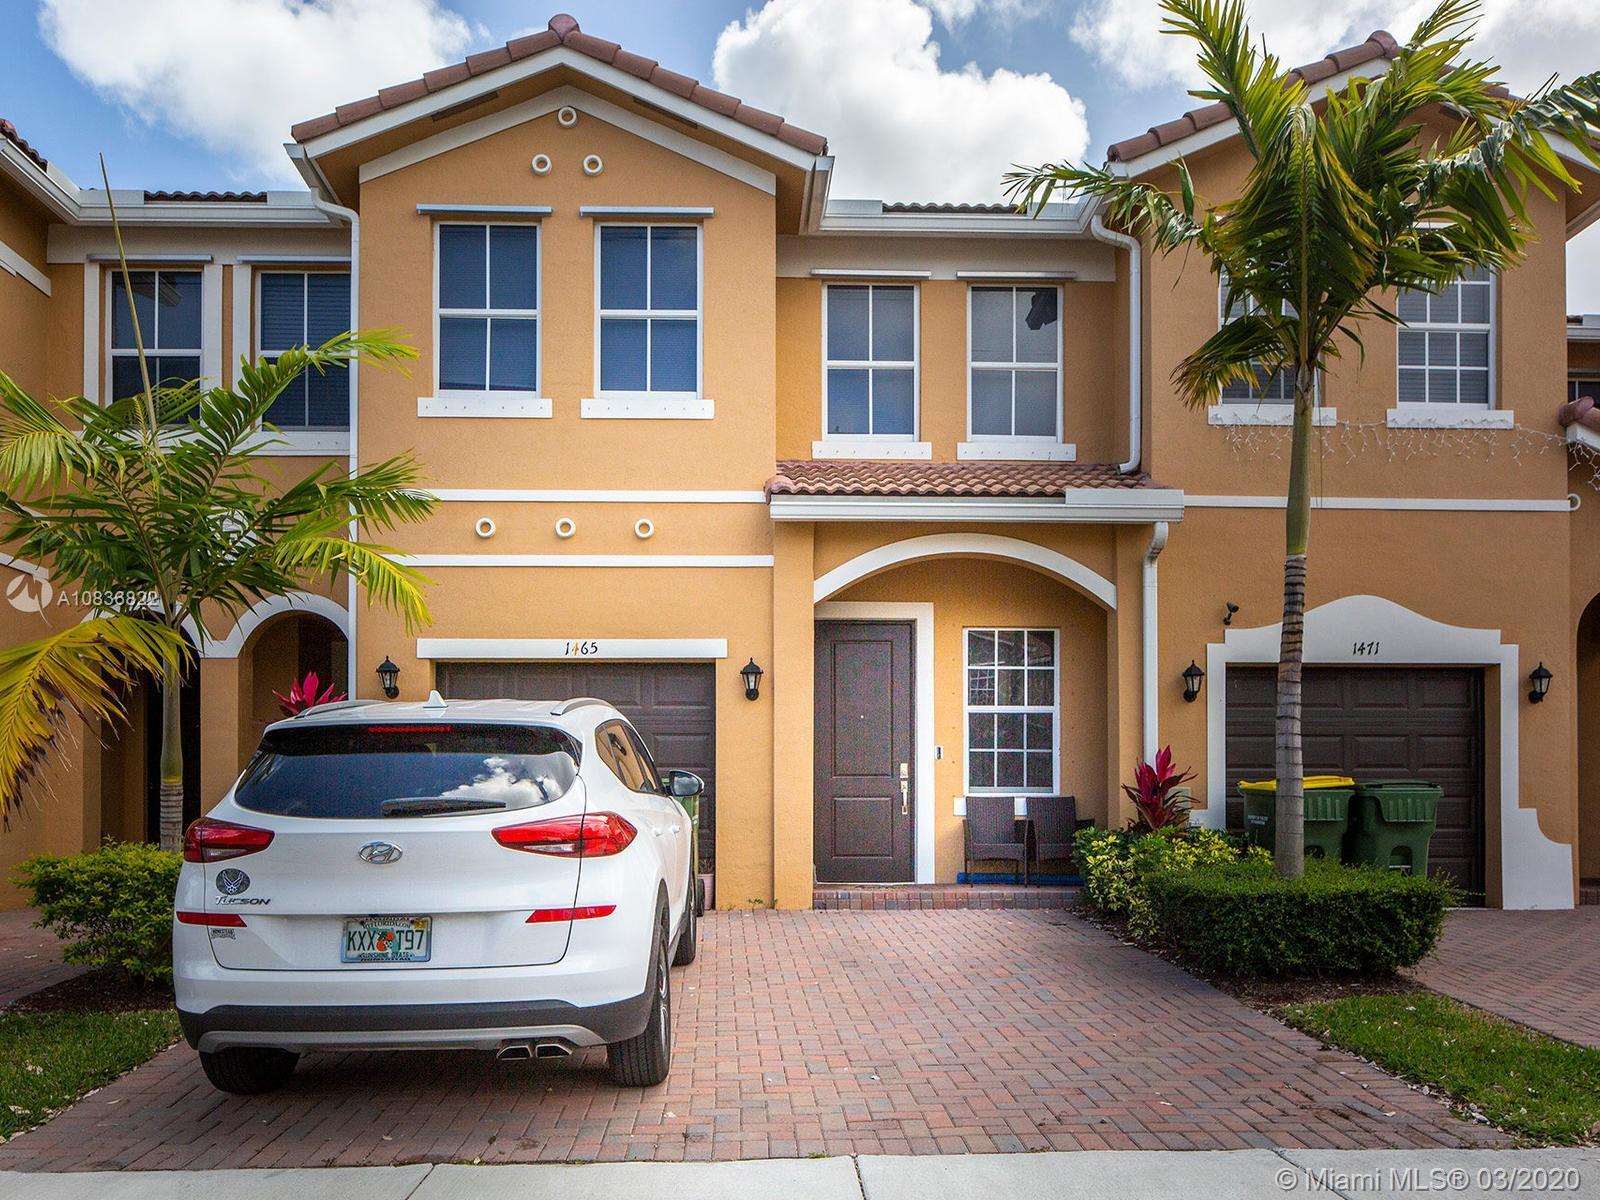 1465 SE 24th Ave #1465, Homestead, FL 33035 - Homestead, FL real estate listing